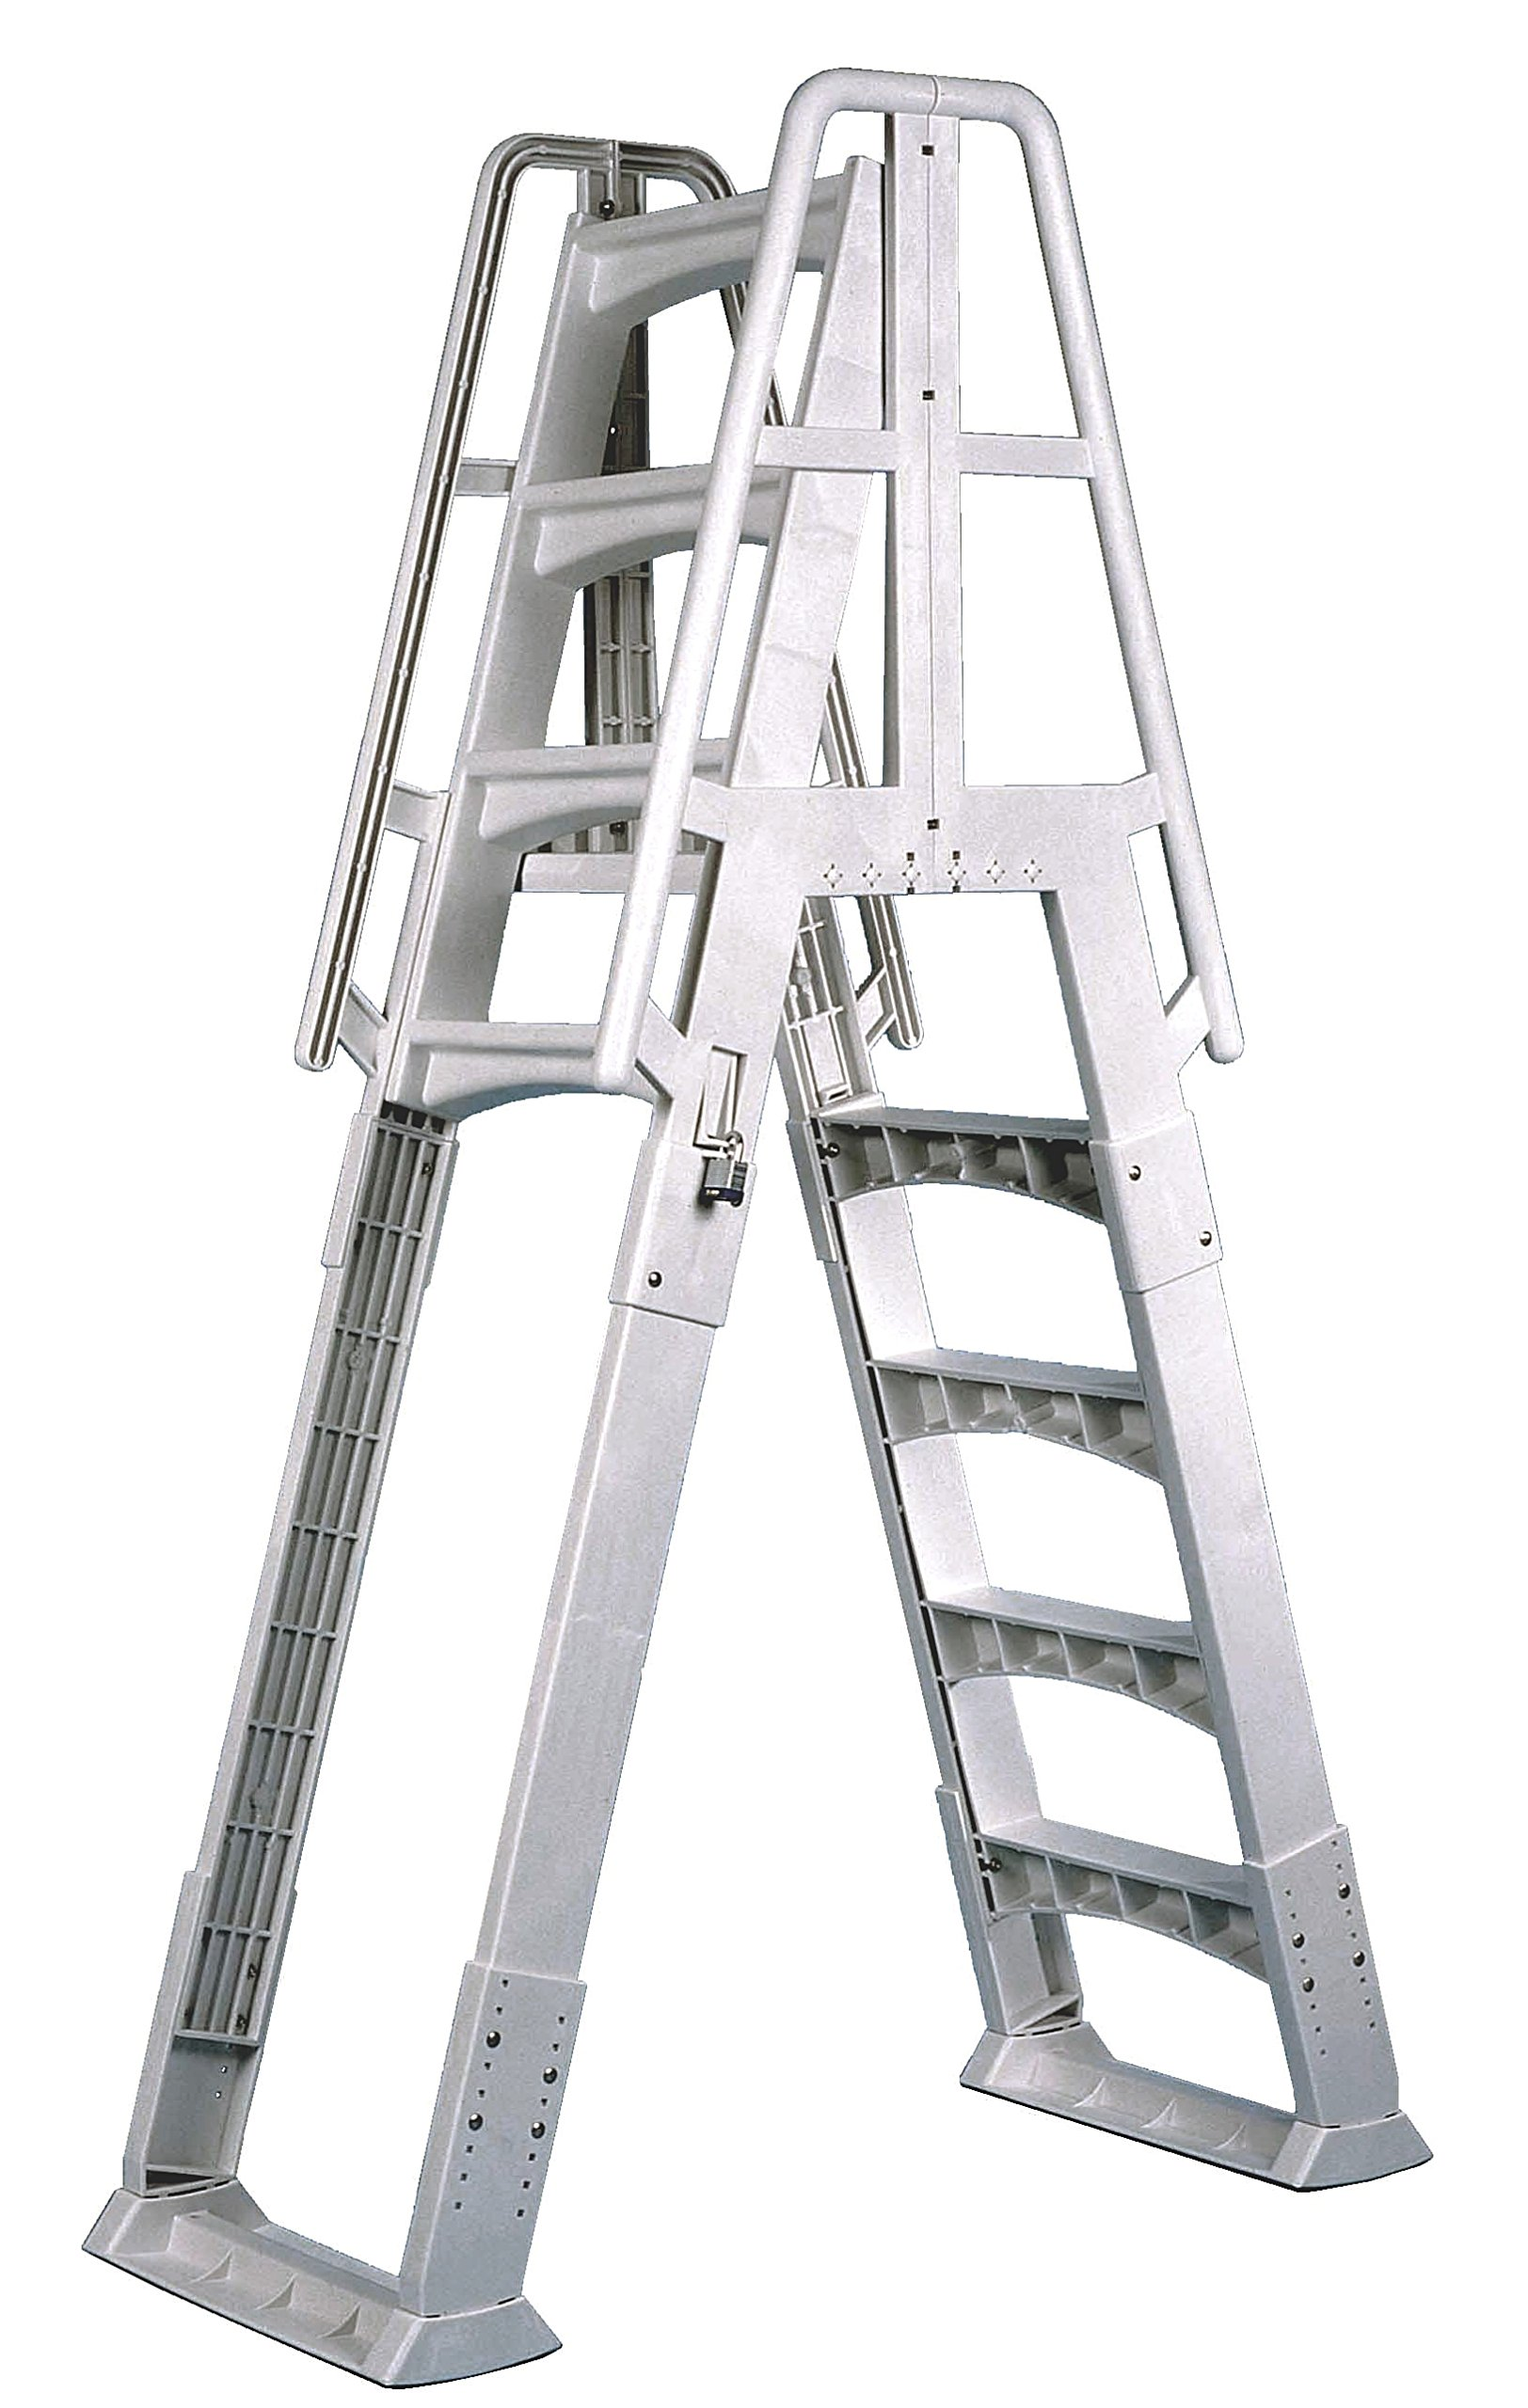 Vinyl Works Slide-Lock A-Frame Above Ground Pool Ladder by Vinyl Works